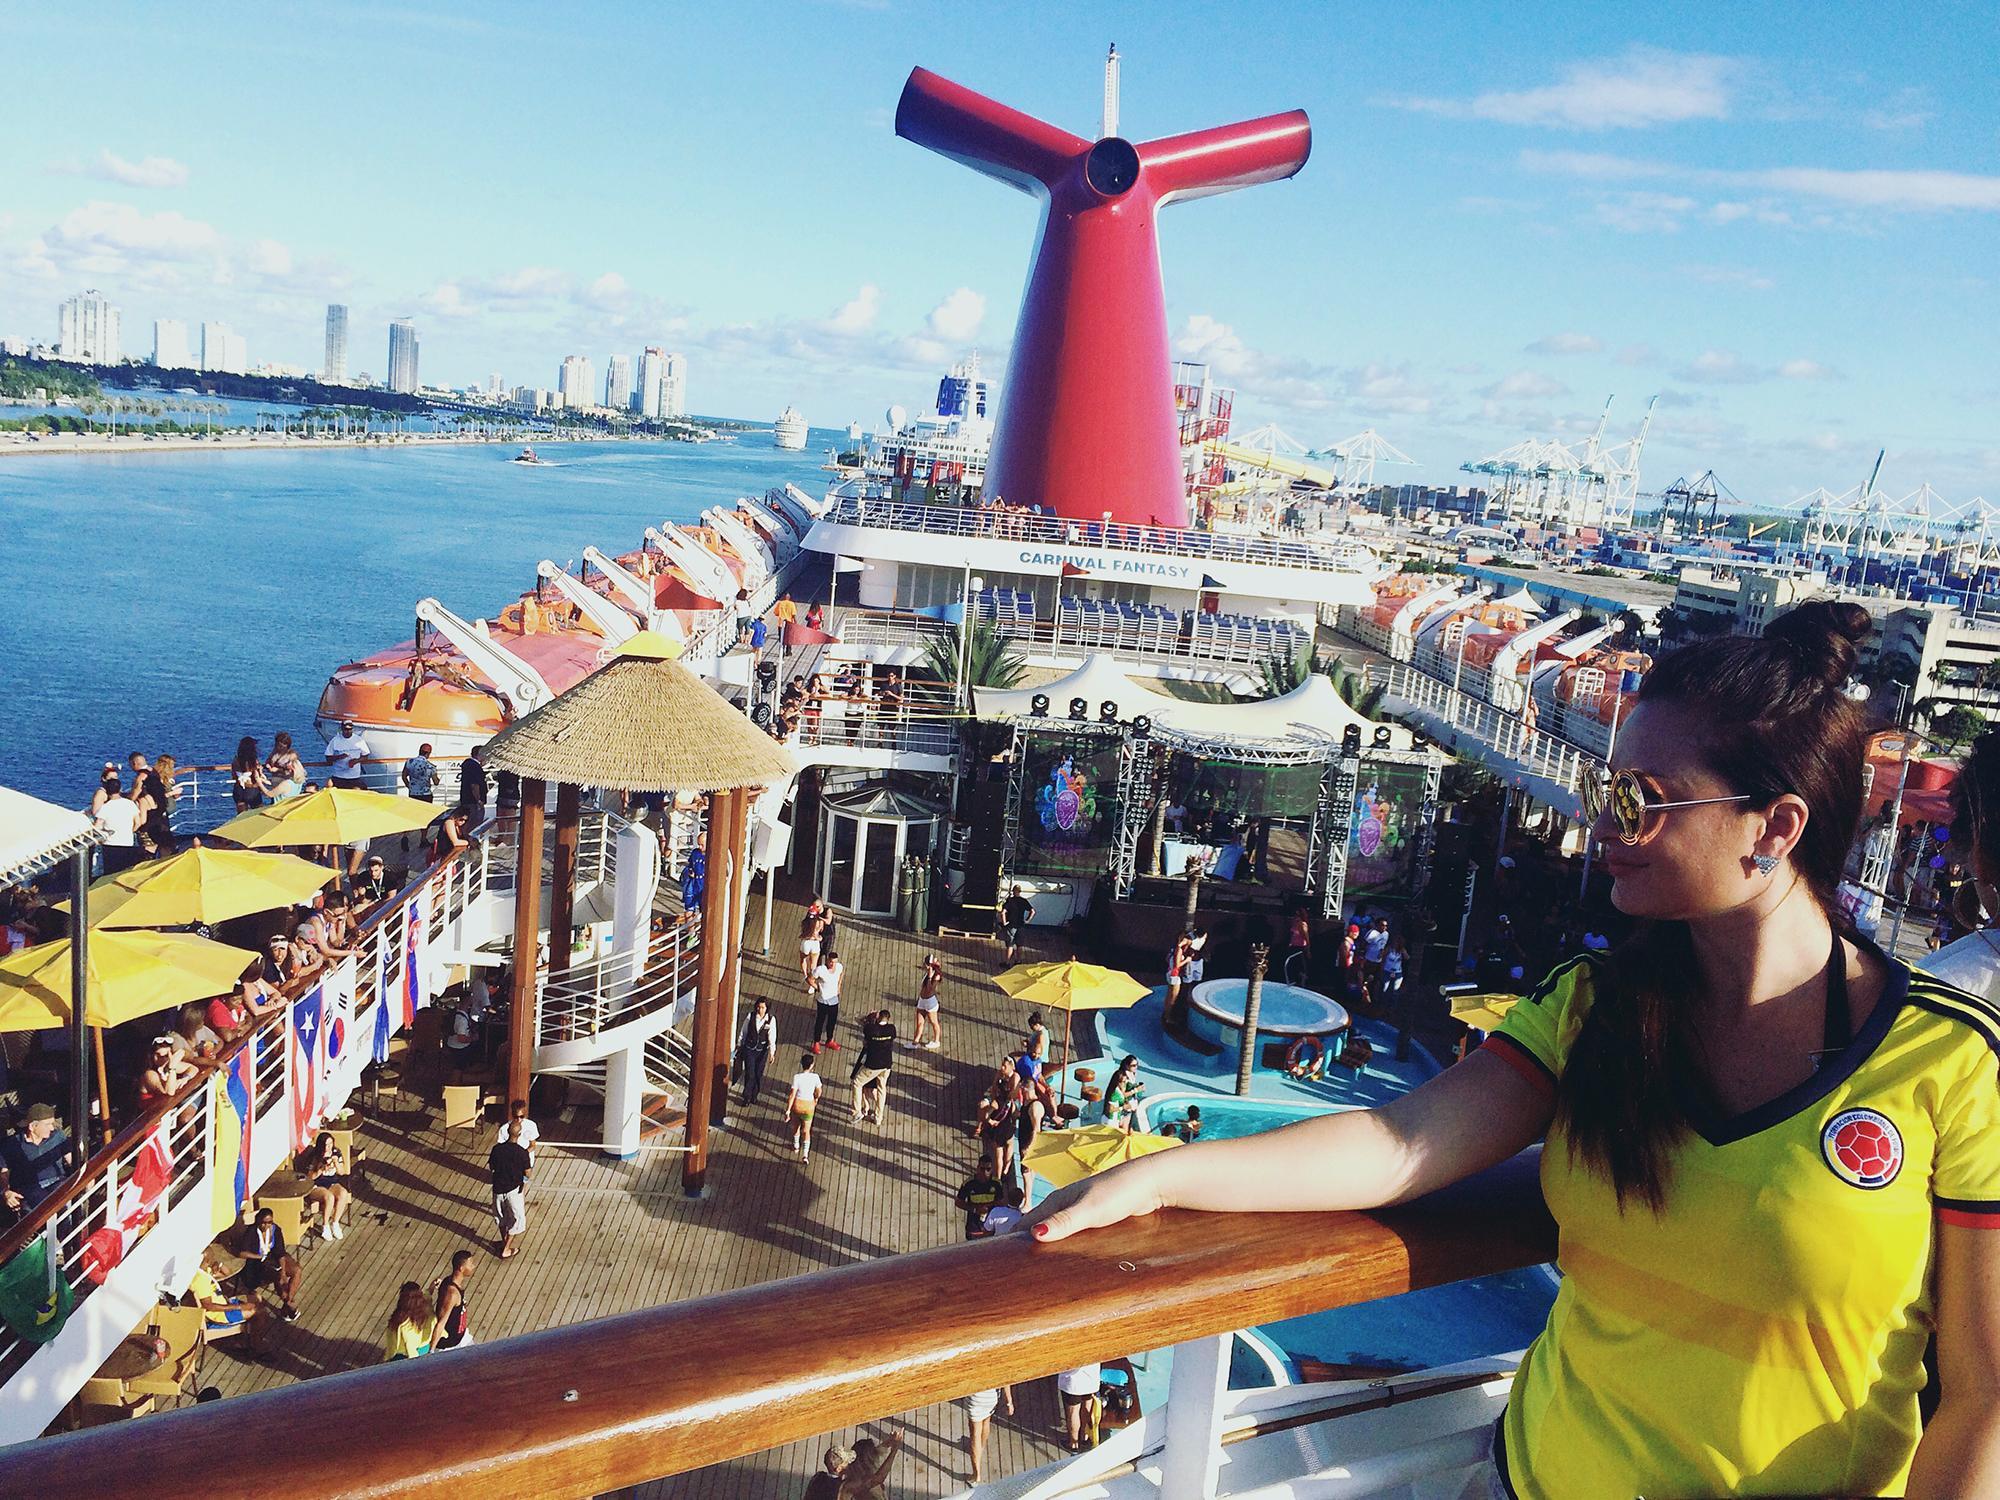 alegria-onboard-aventura-dance-cruise-07